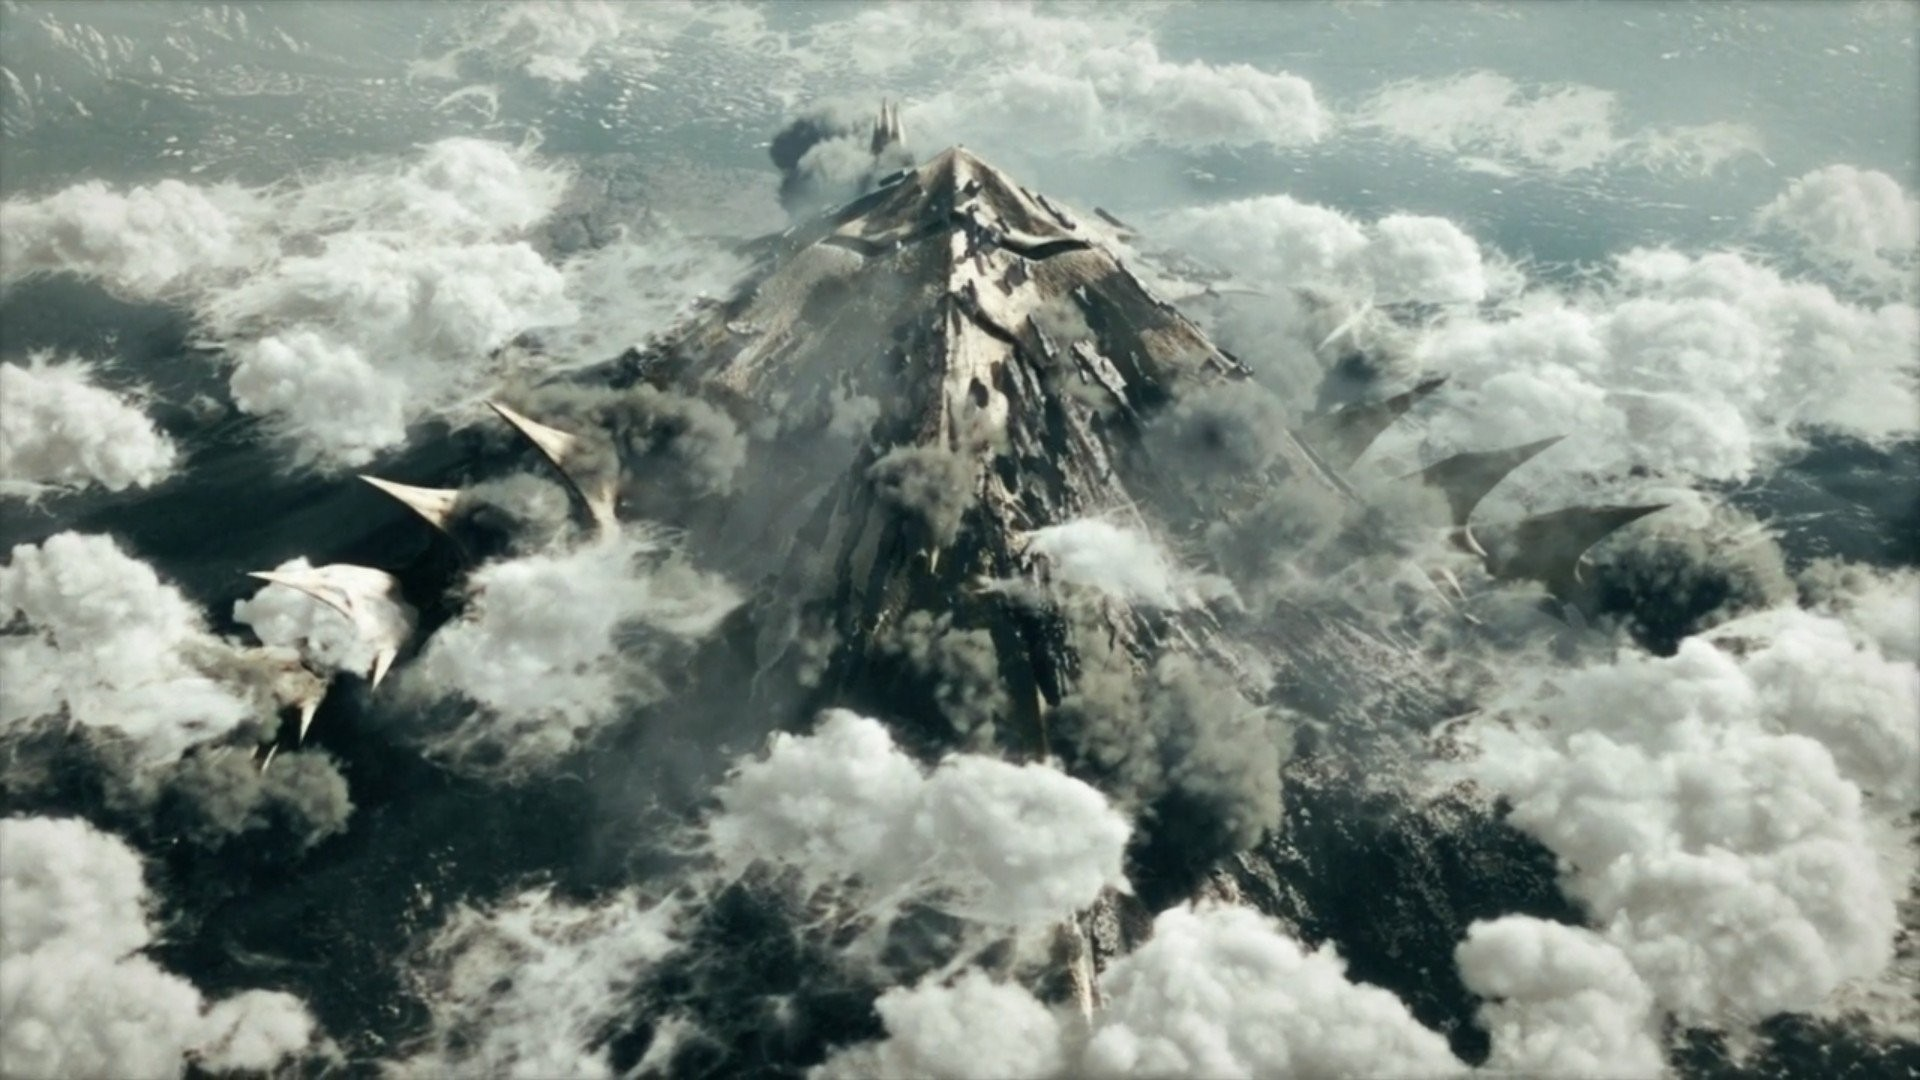 Movies robots futuristic mecha CGI spaceships battles screens Planzet  wallpaper | | 345954 | WallpaperUP